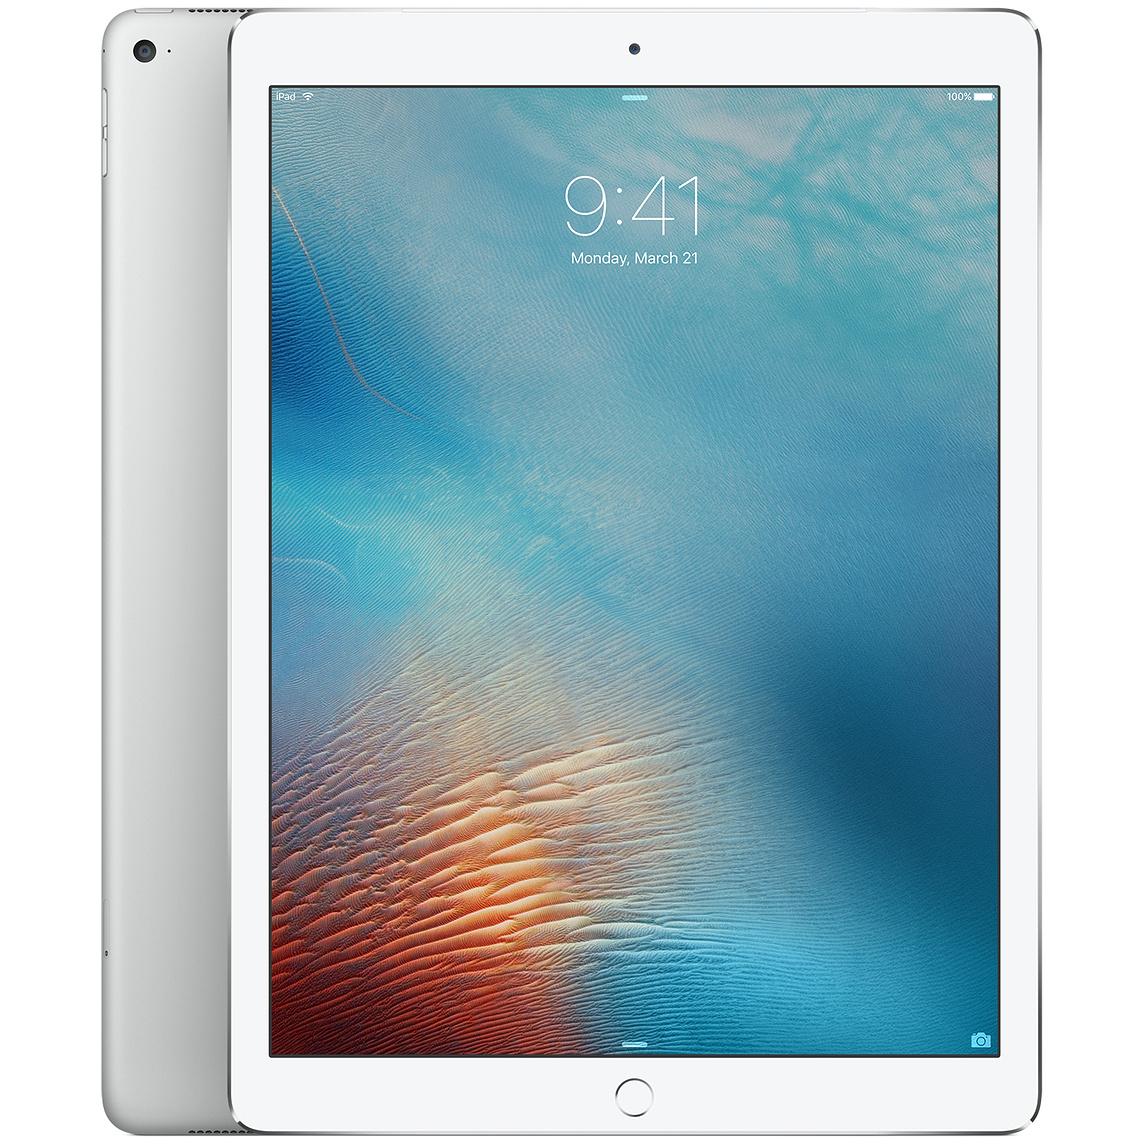 iPad Pro 12.9″ Silver 128gb WiFi+Cellular